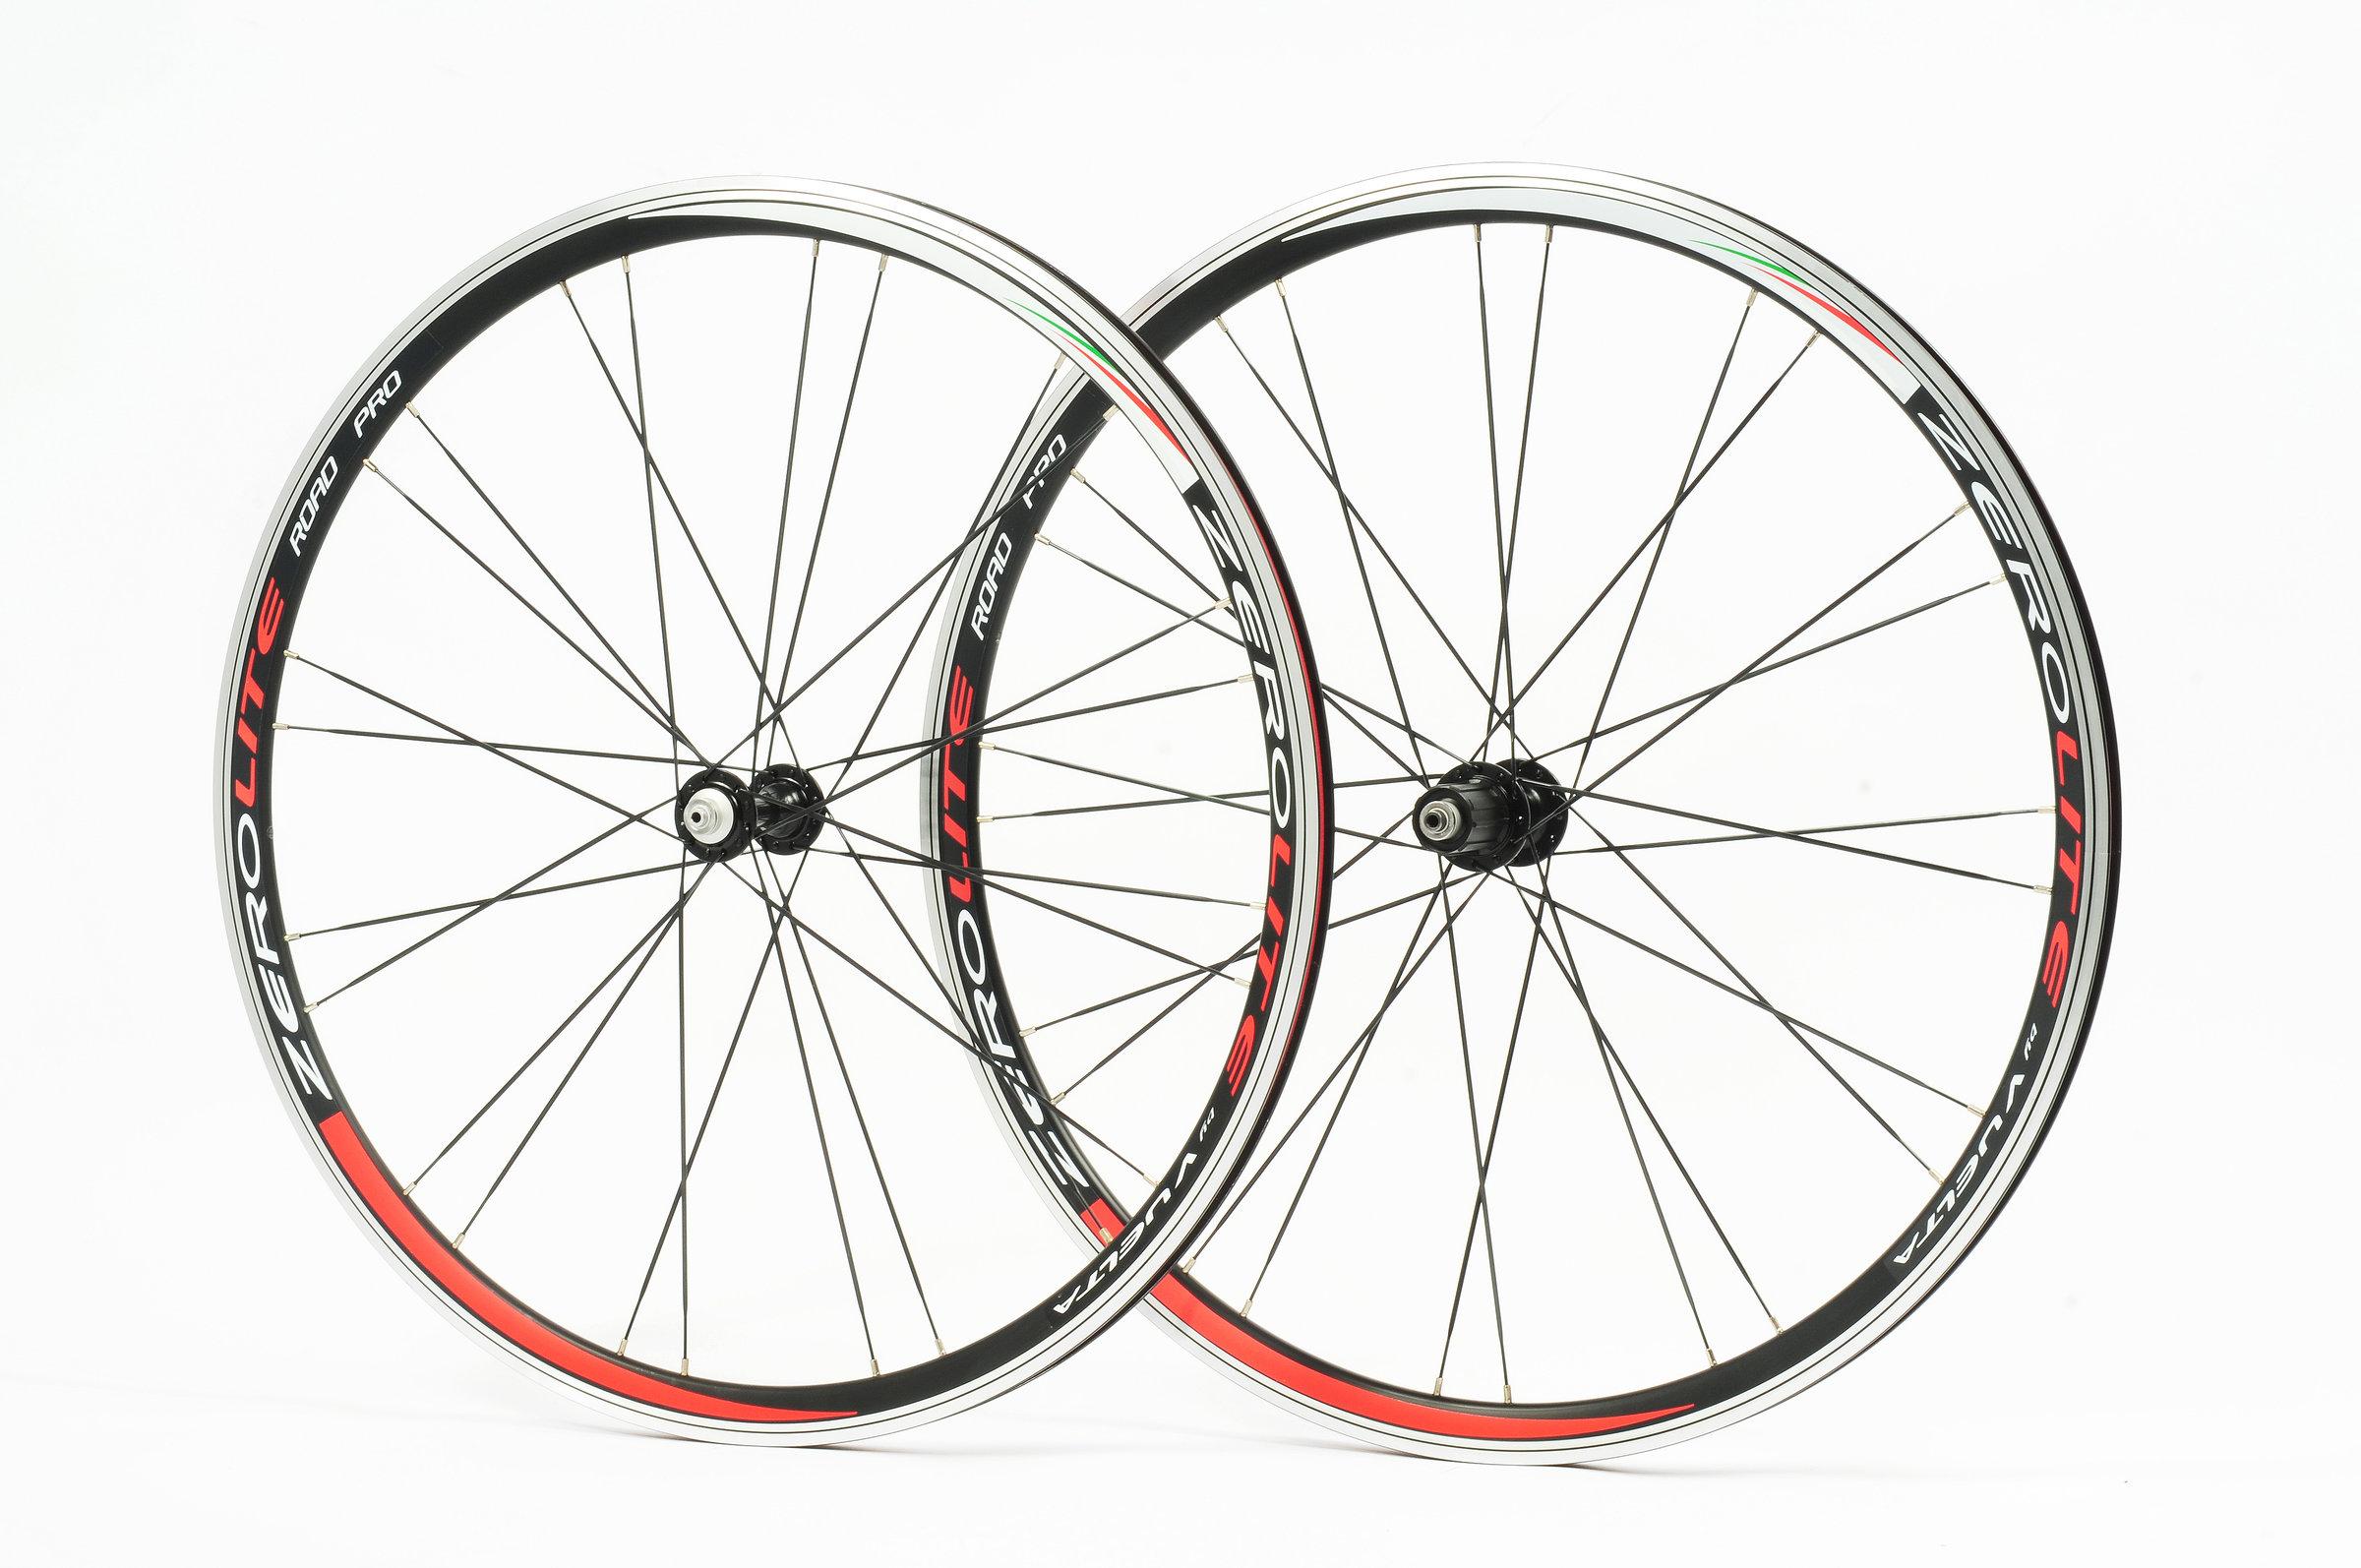 Vuelta Zerolite Road Pro 700c 10sp Wheelset Wheel World Bike Shops